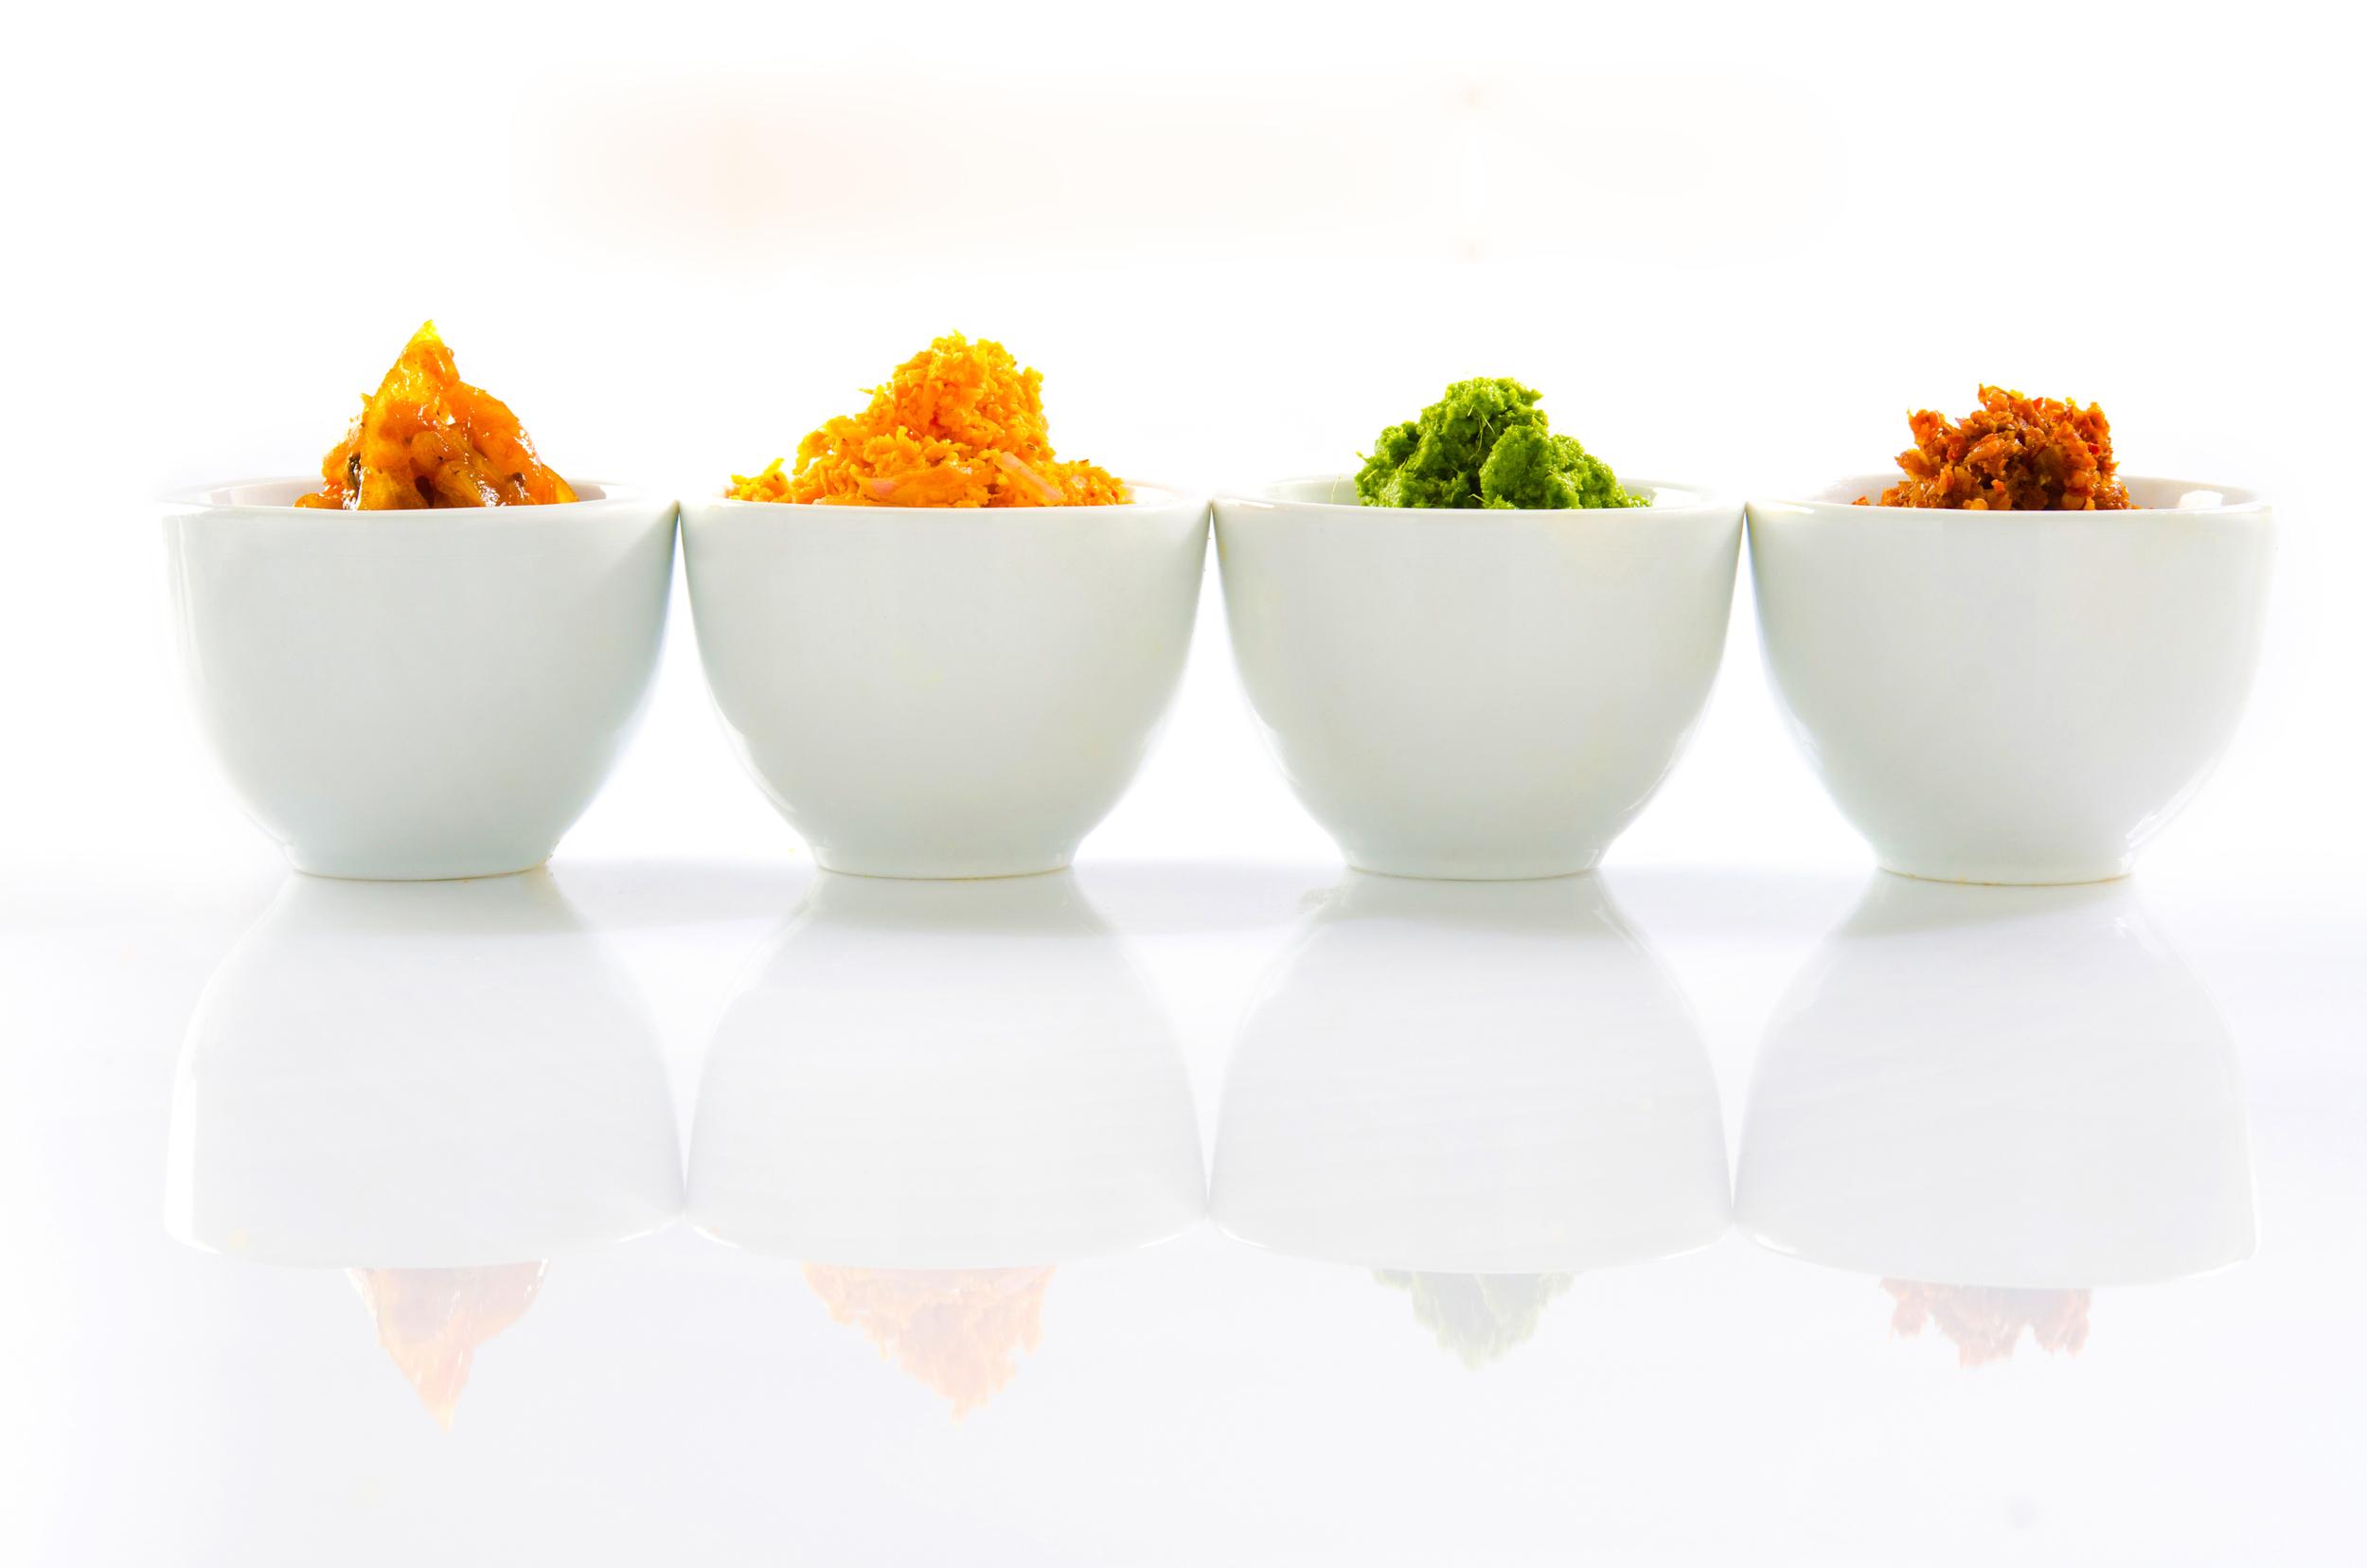 fine-food-photographer.jpg